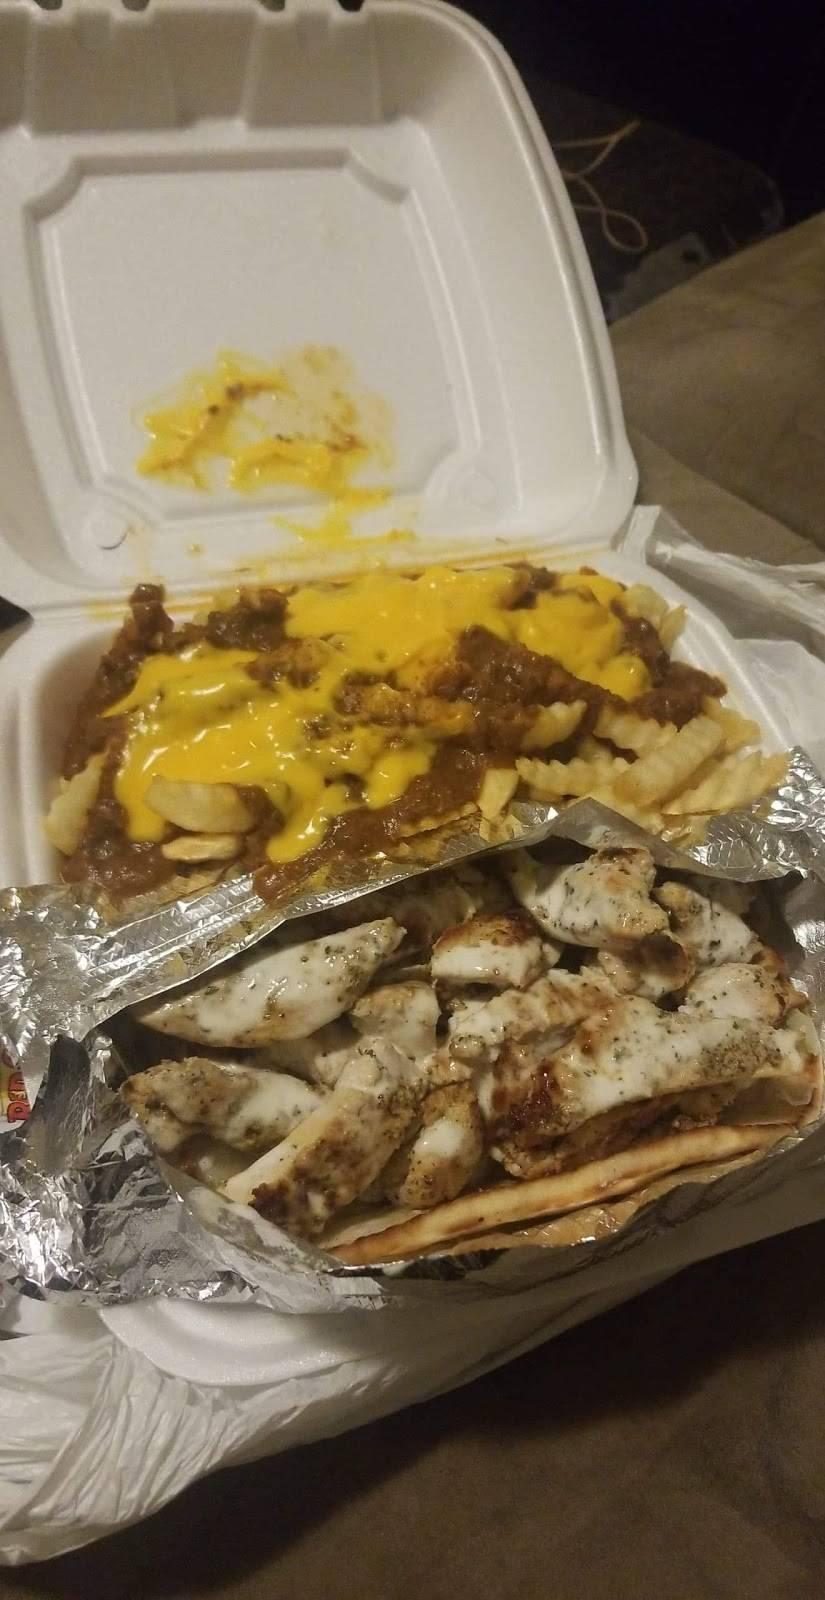 Nicky Ds Coney Island   restaurant   3357 W Davison St, Detroit, MI 48238, USA   3138654500 OR +1 313-865-4500